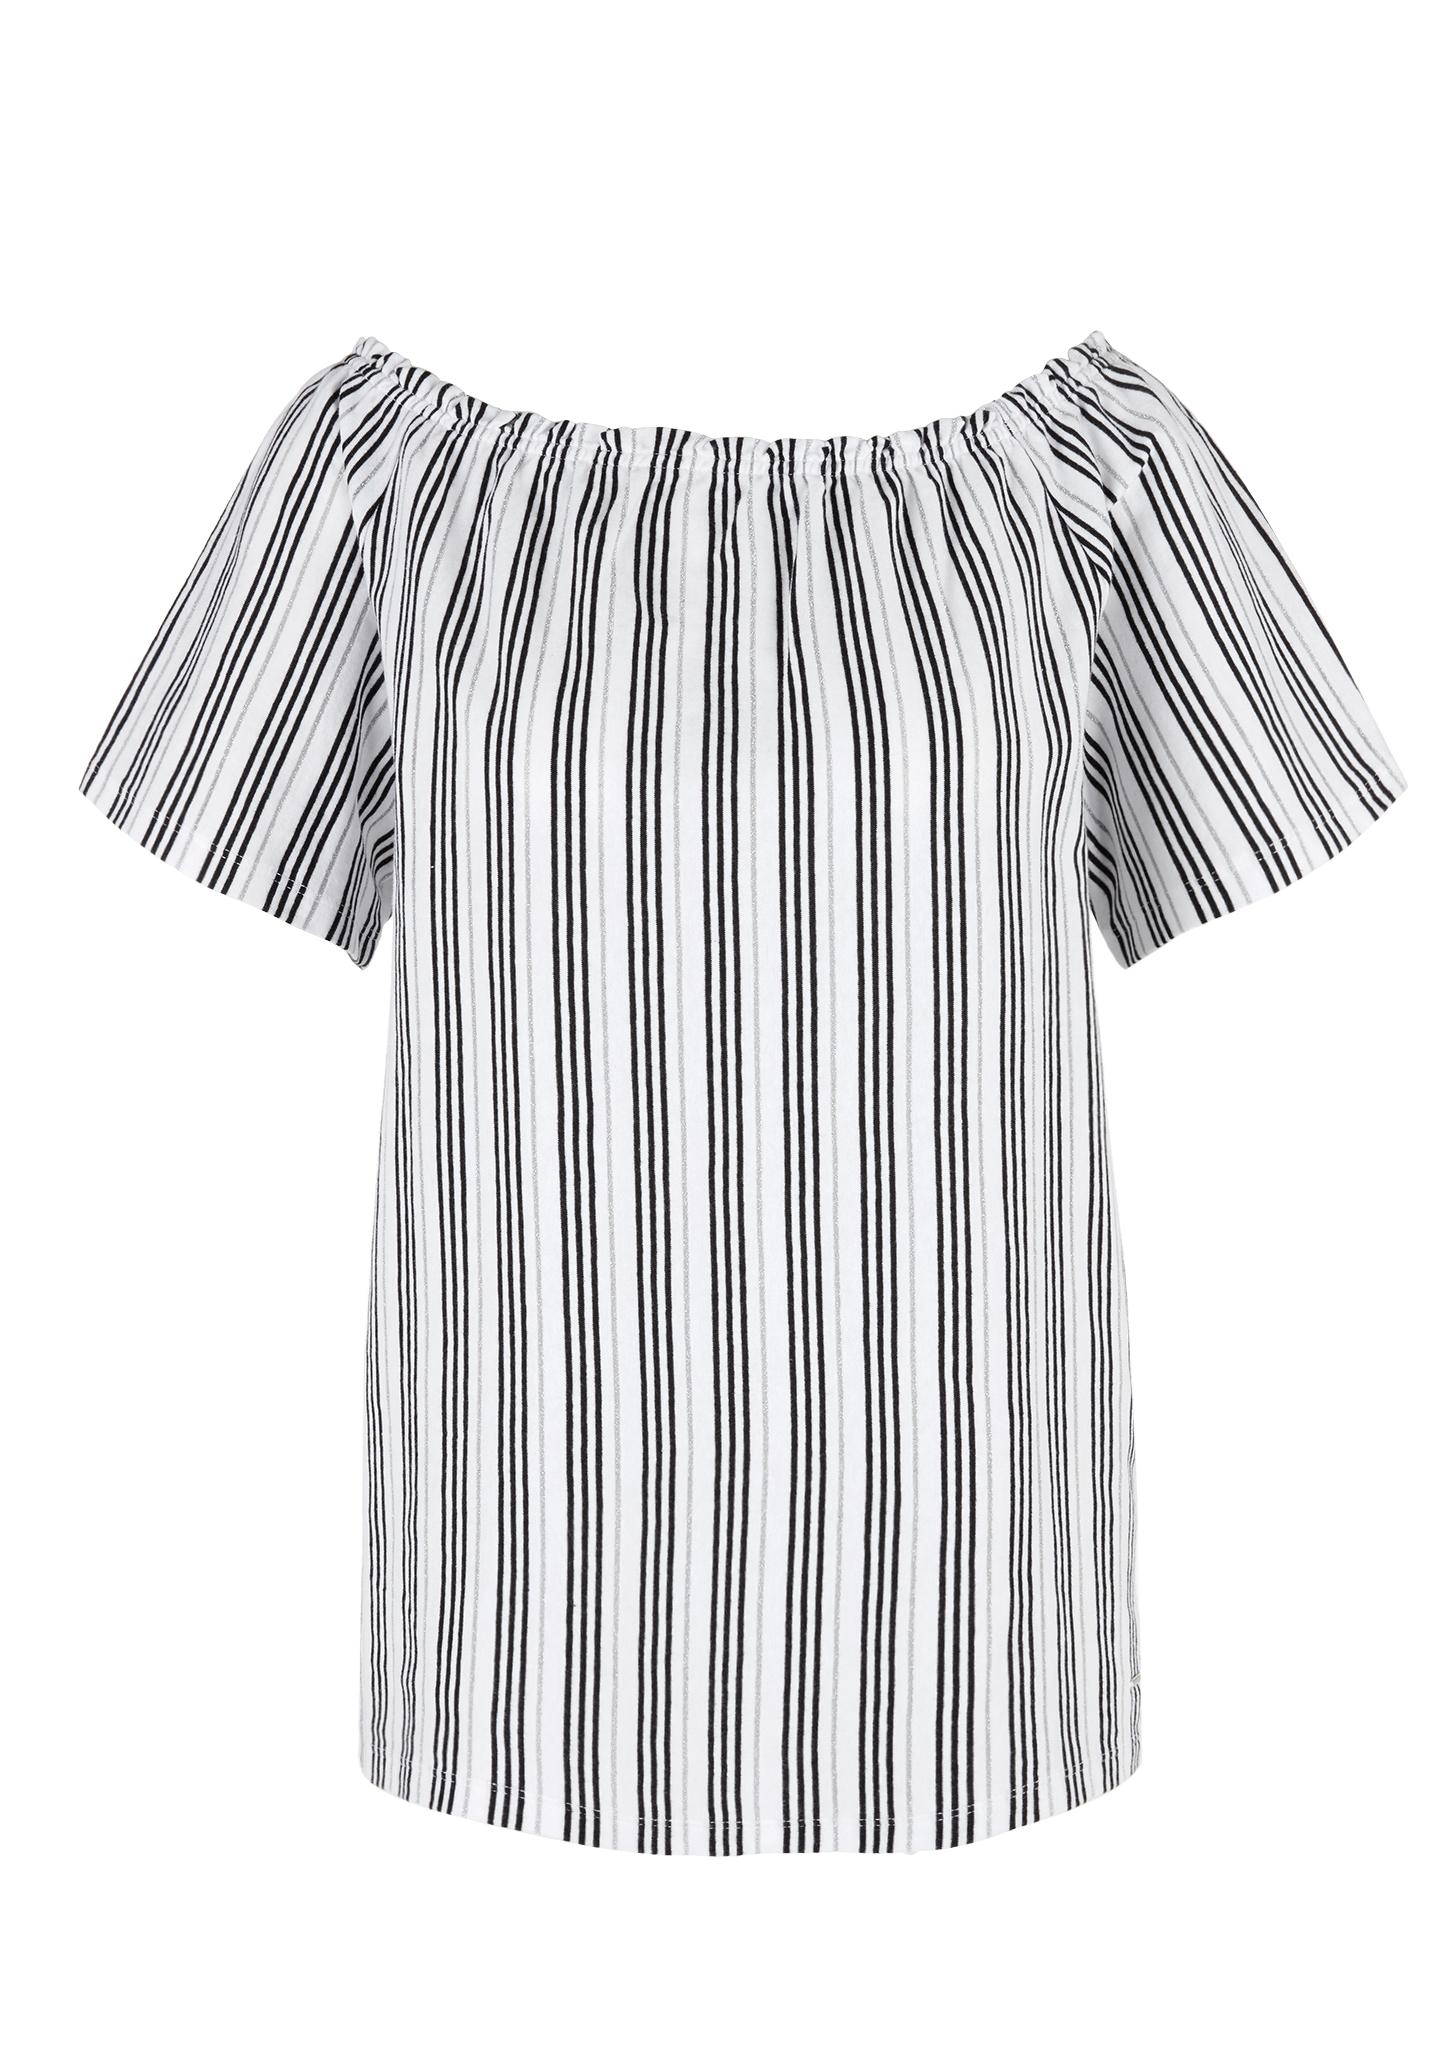 Carmenshirt | Bekleidung > Shirts > Carmenshirts & Wasserfallshirts | TRIANGLE